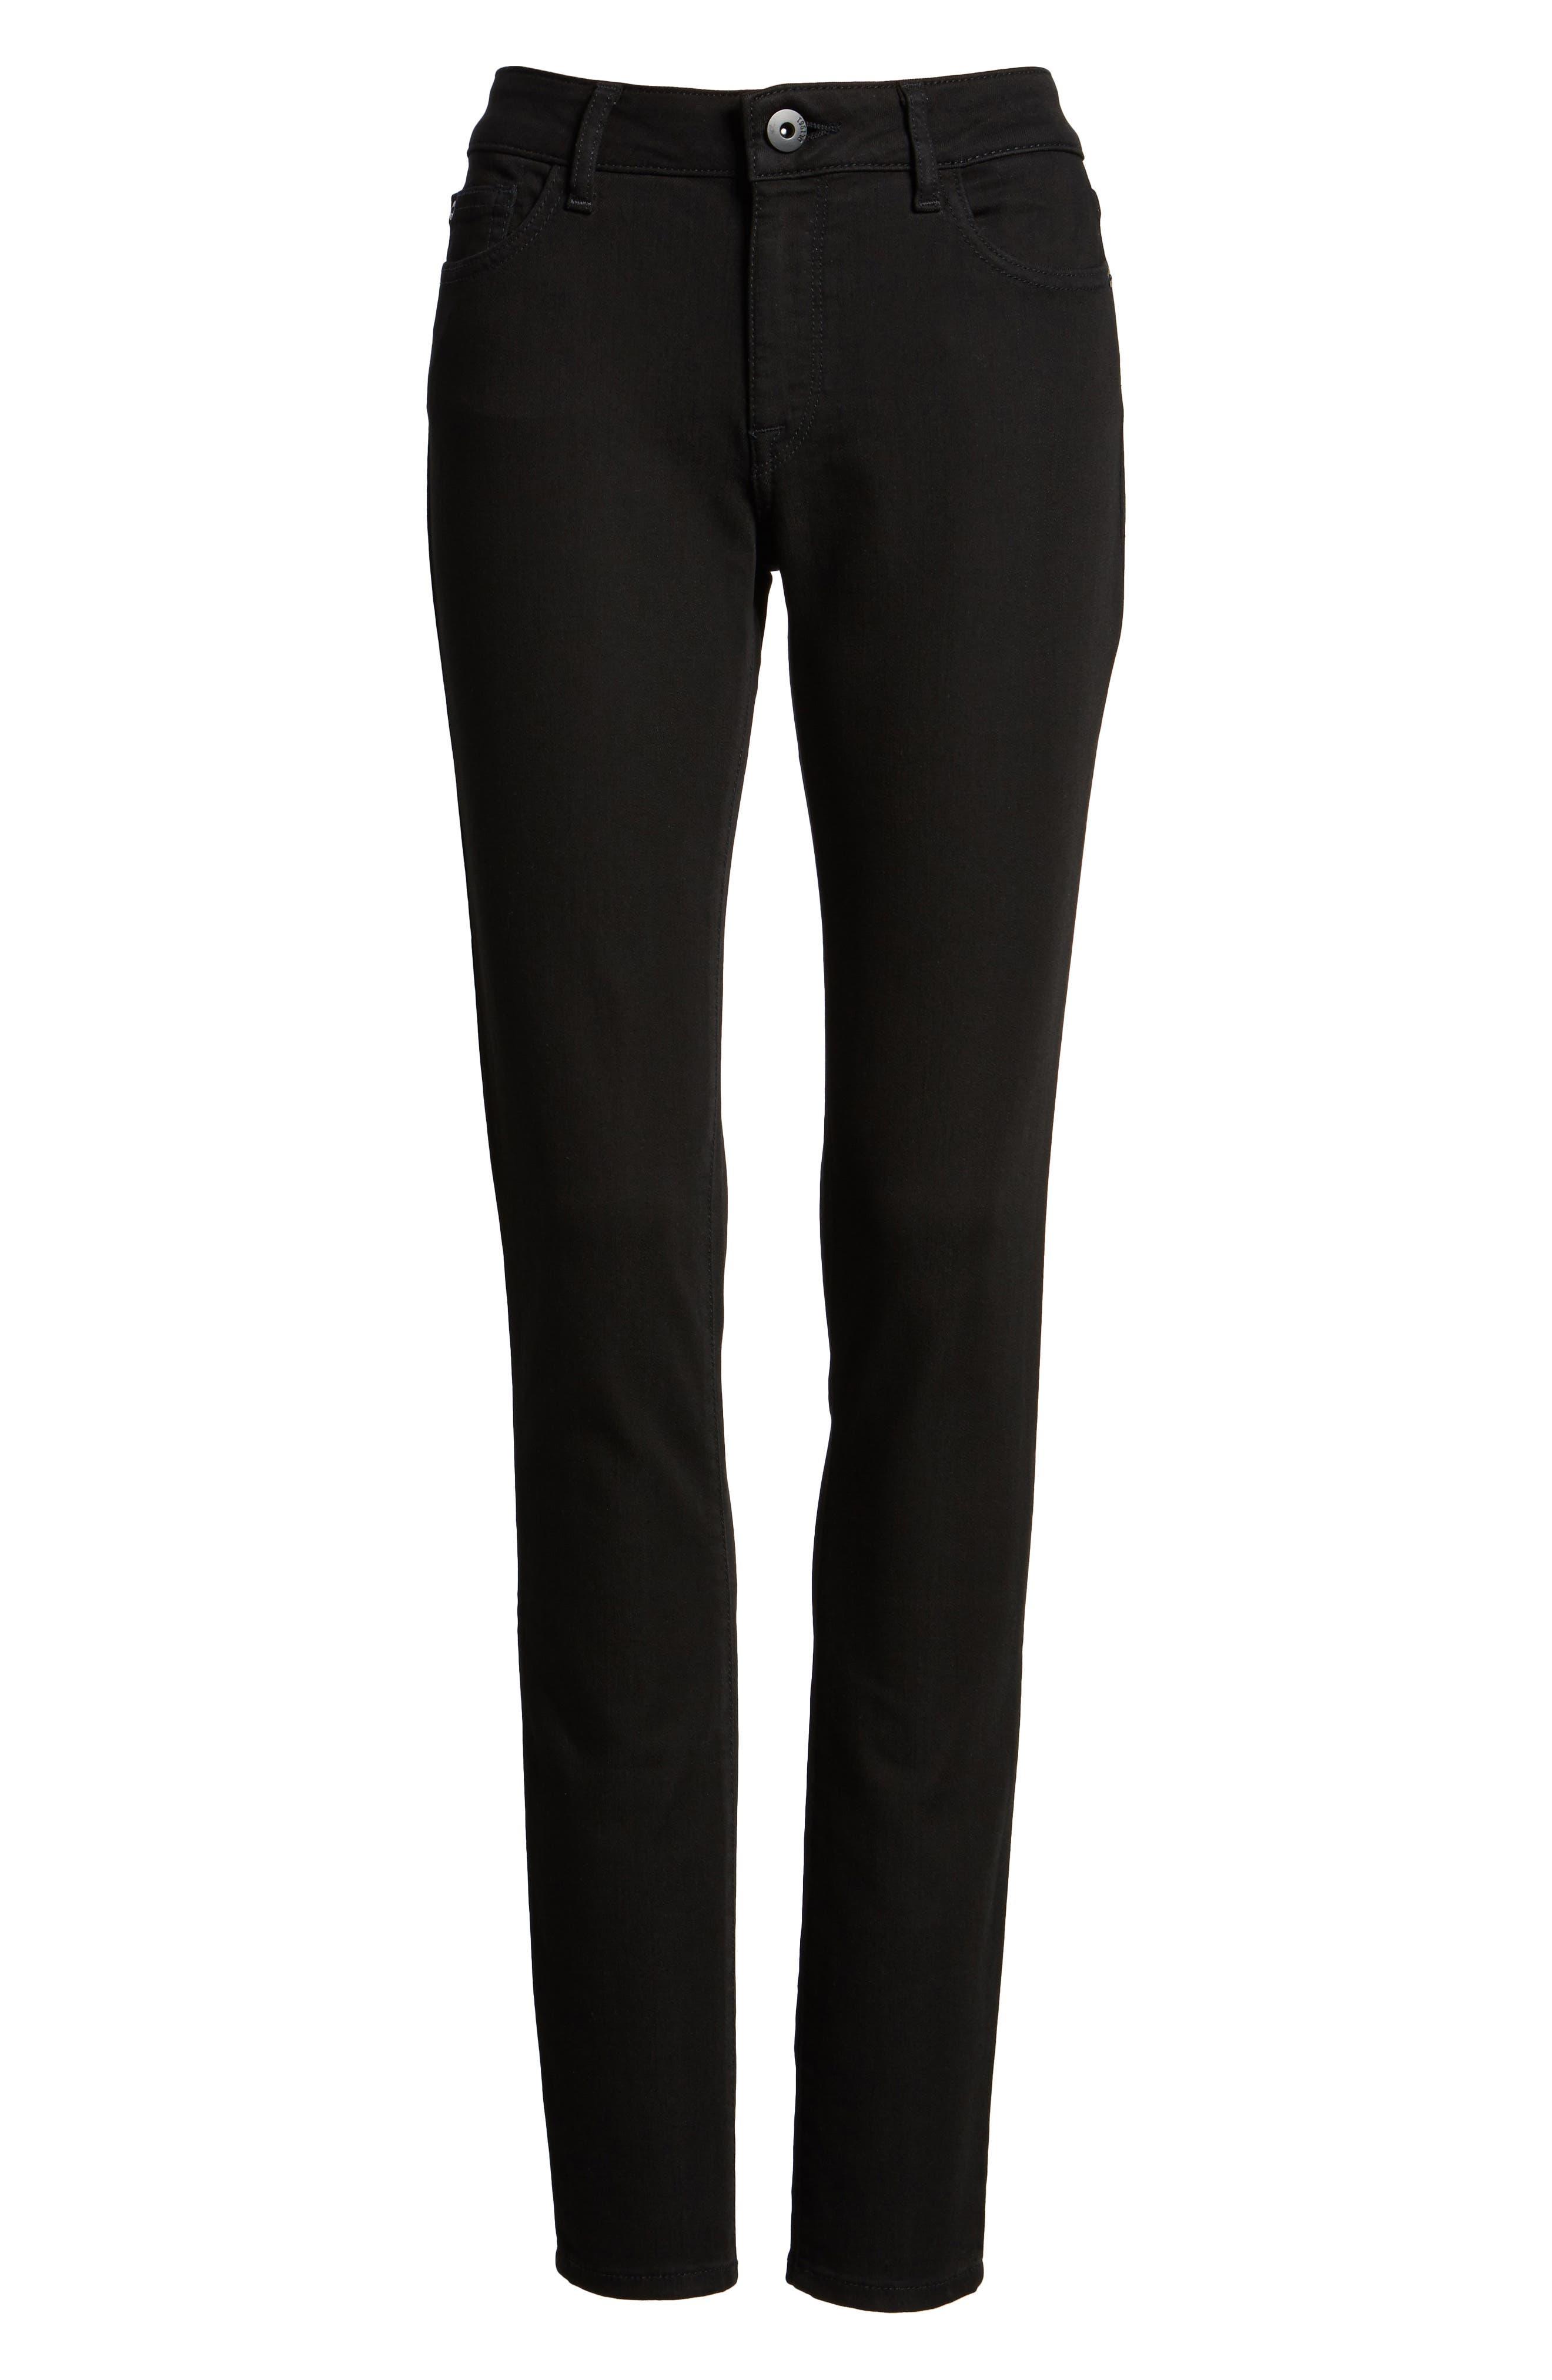 DL1961 'Danny' Instasculpt Skinny Jeans, Main, color, 001